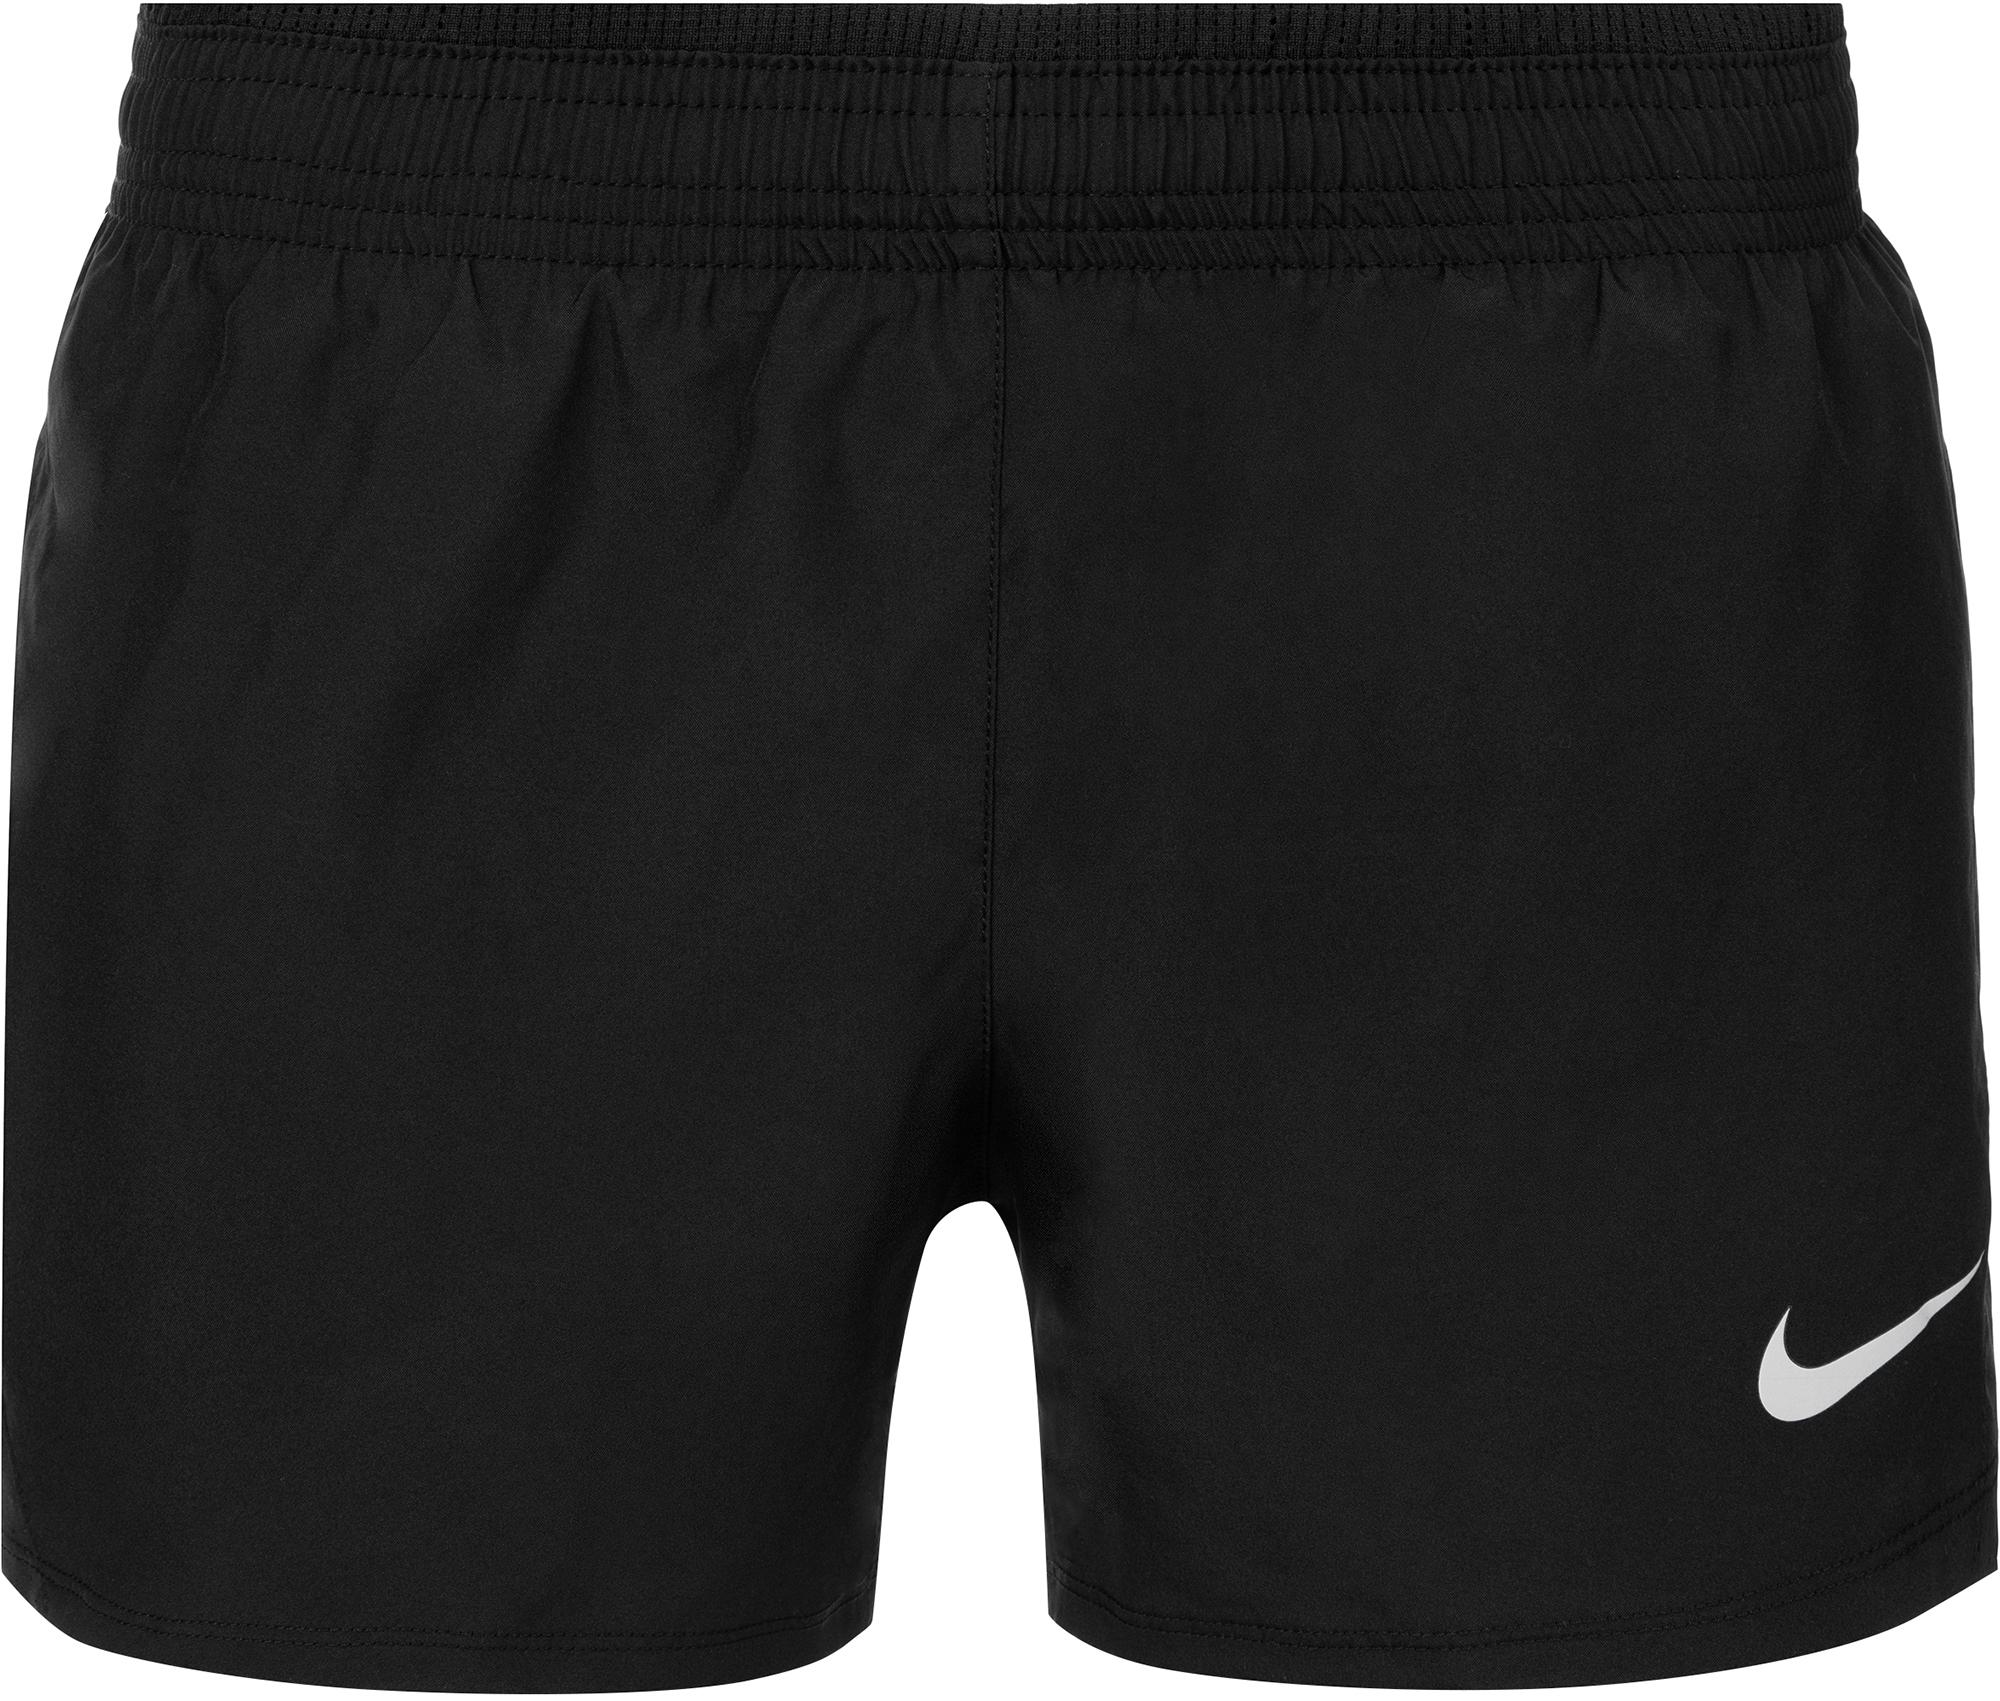 Nike Шорты женские Nike 10K, размер 40-42